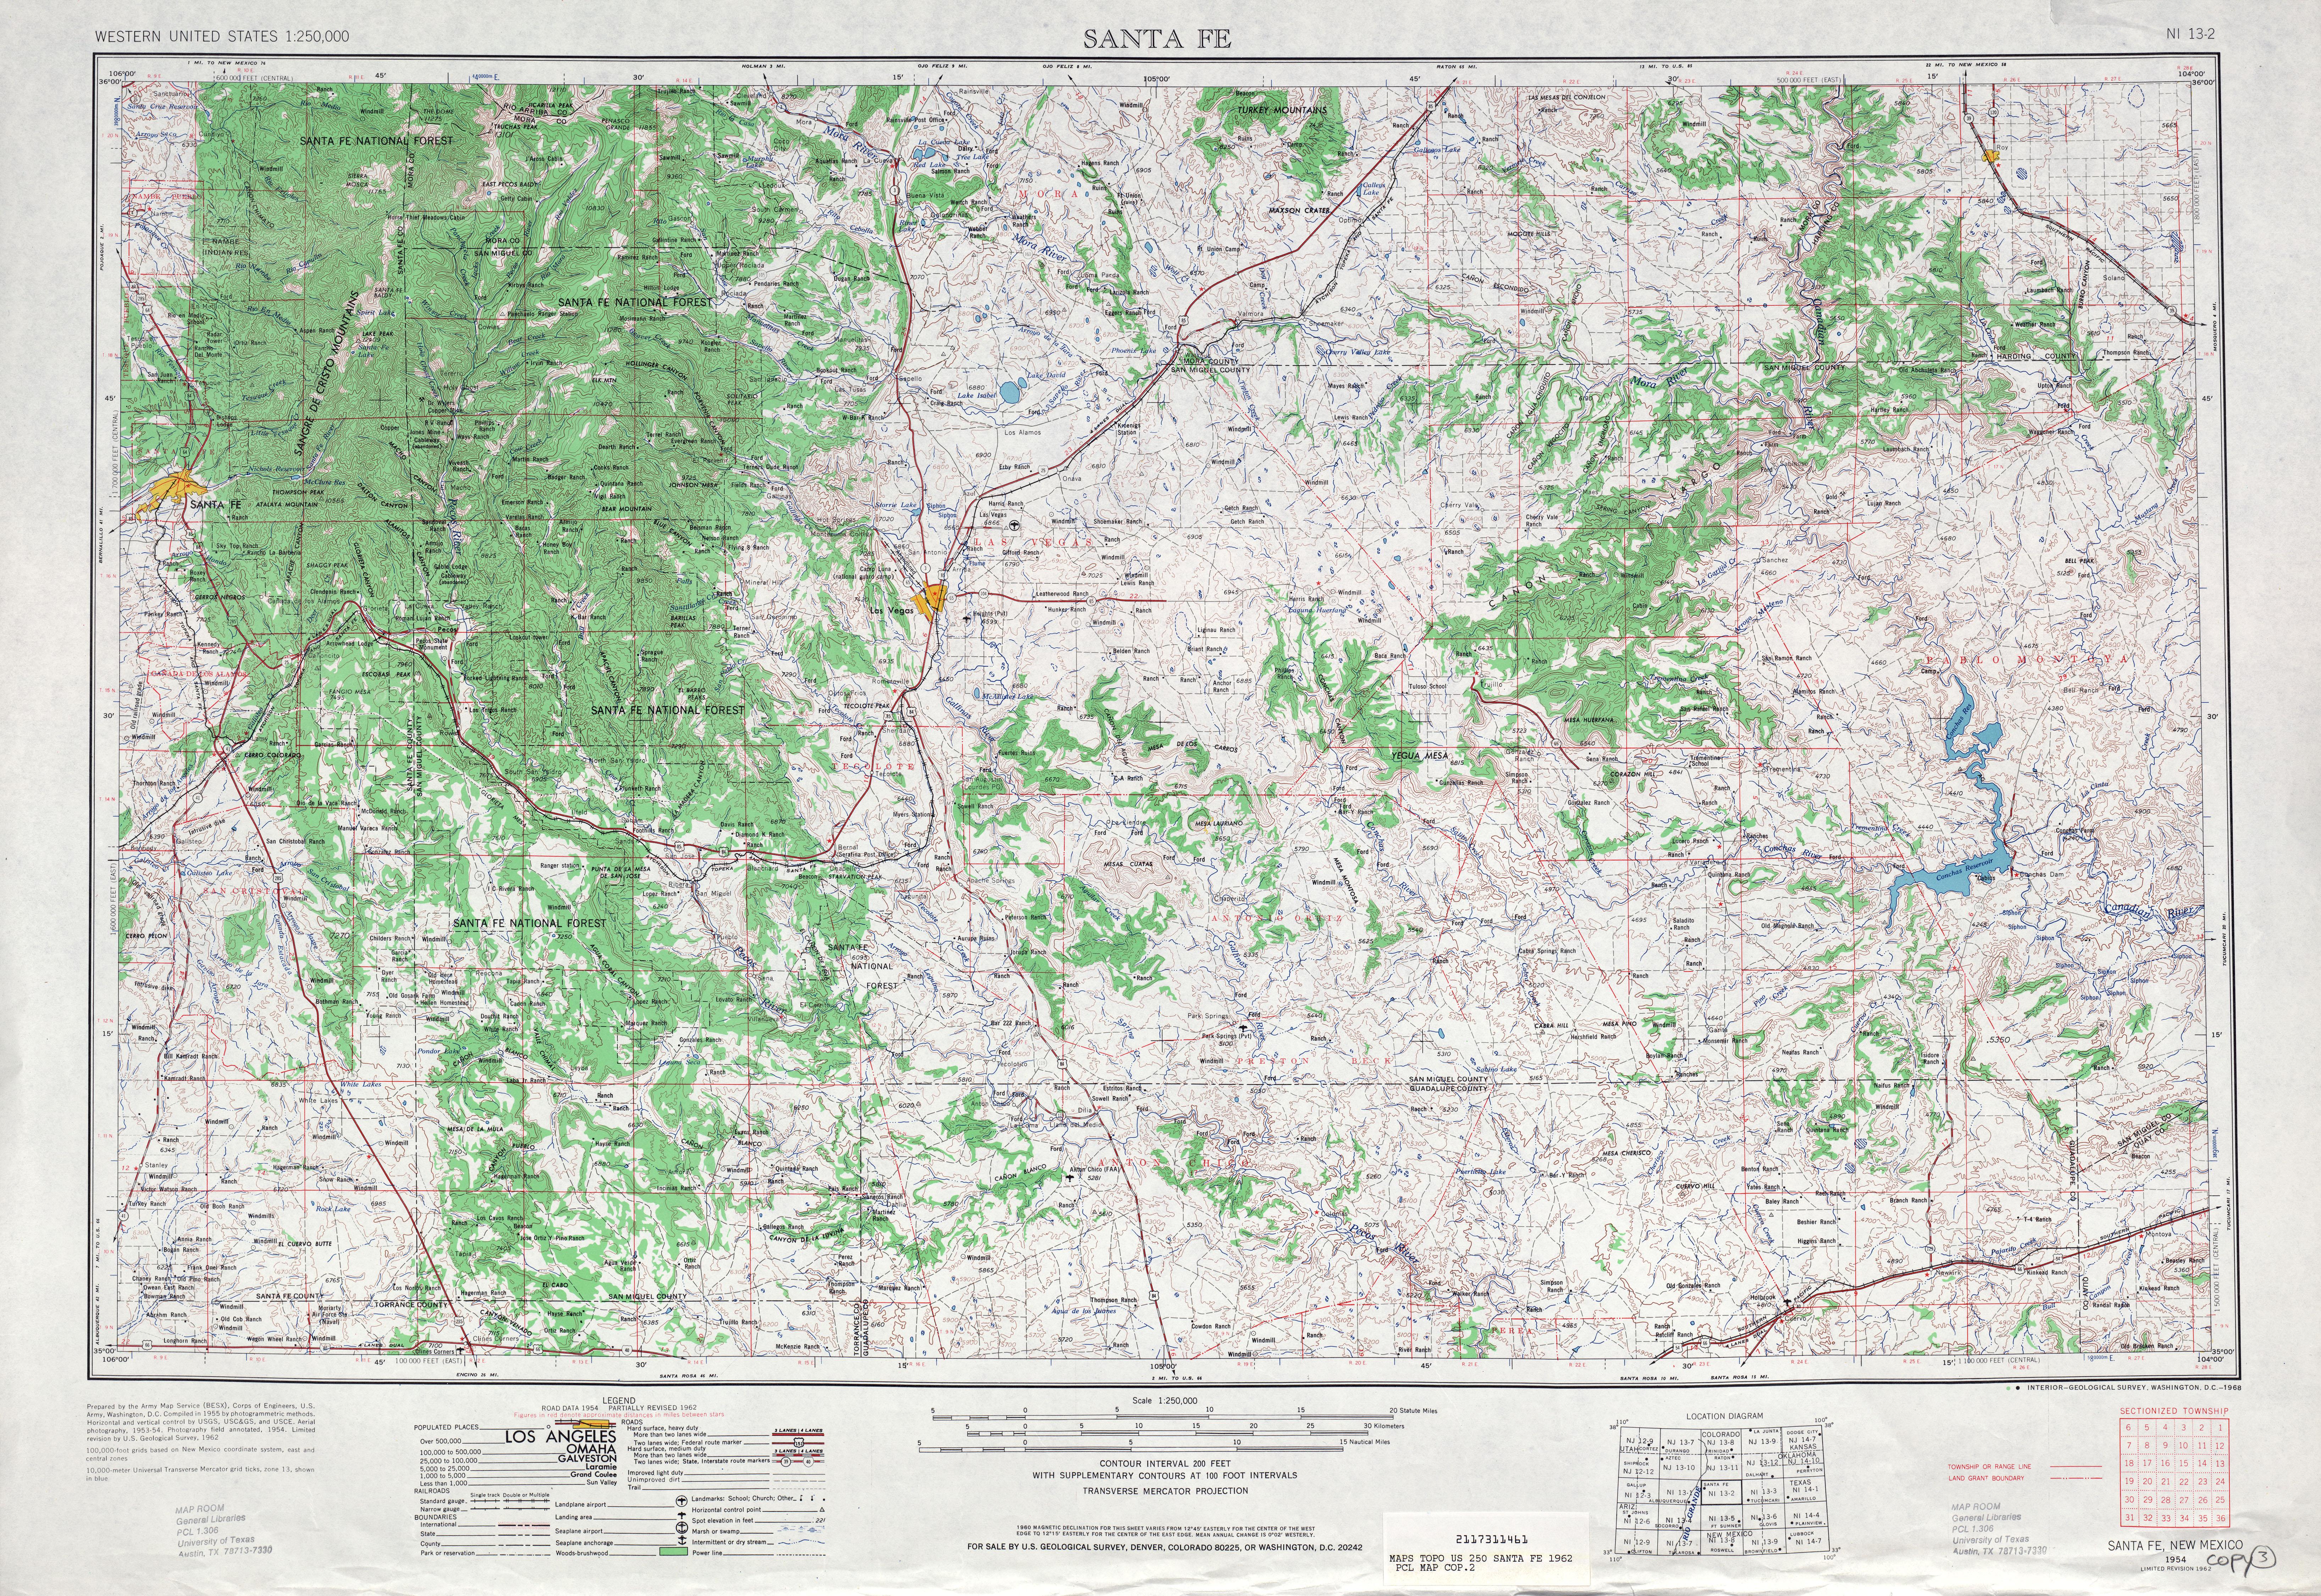 Santa Fe Topographic Map Sheet, United States 1962